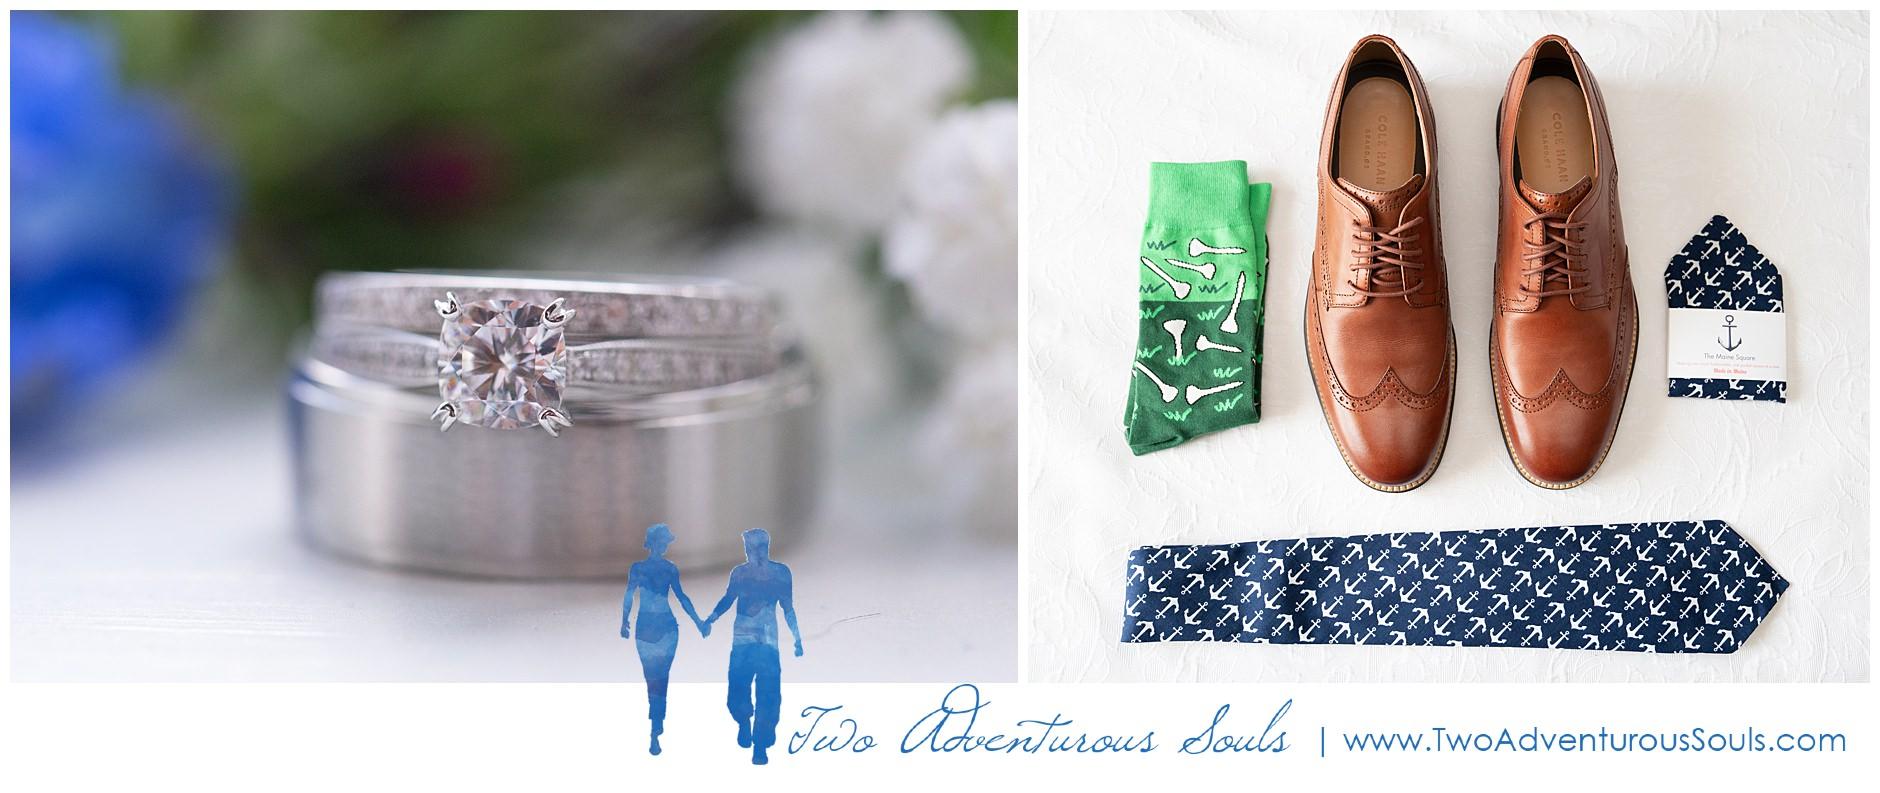 Maine Wedding Photographers, SMCC Wedding Photographers, Southern Maine Community College Wedding Photographers, Two Adventurous Souls-AshleyAaron_0003.jpg